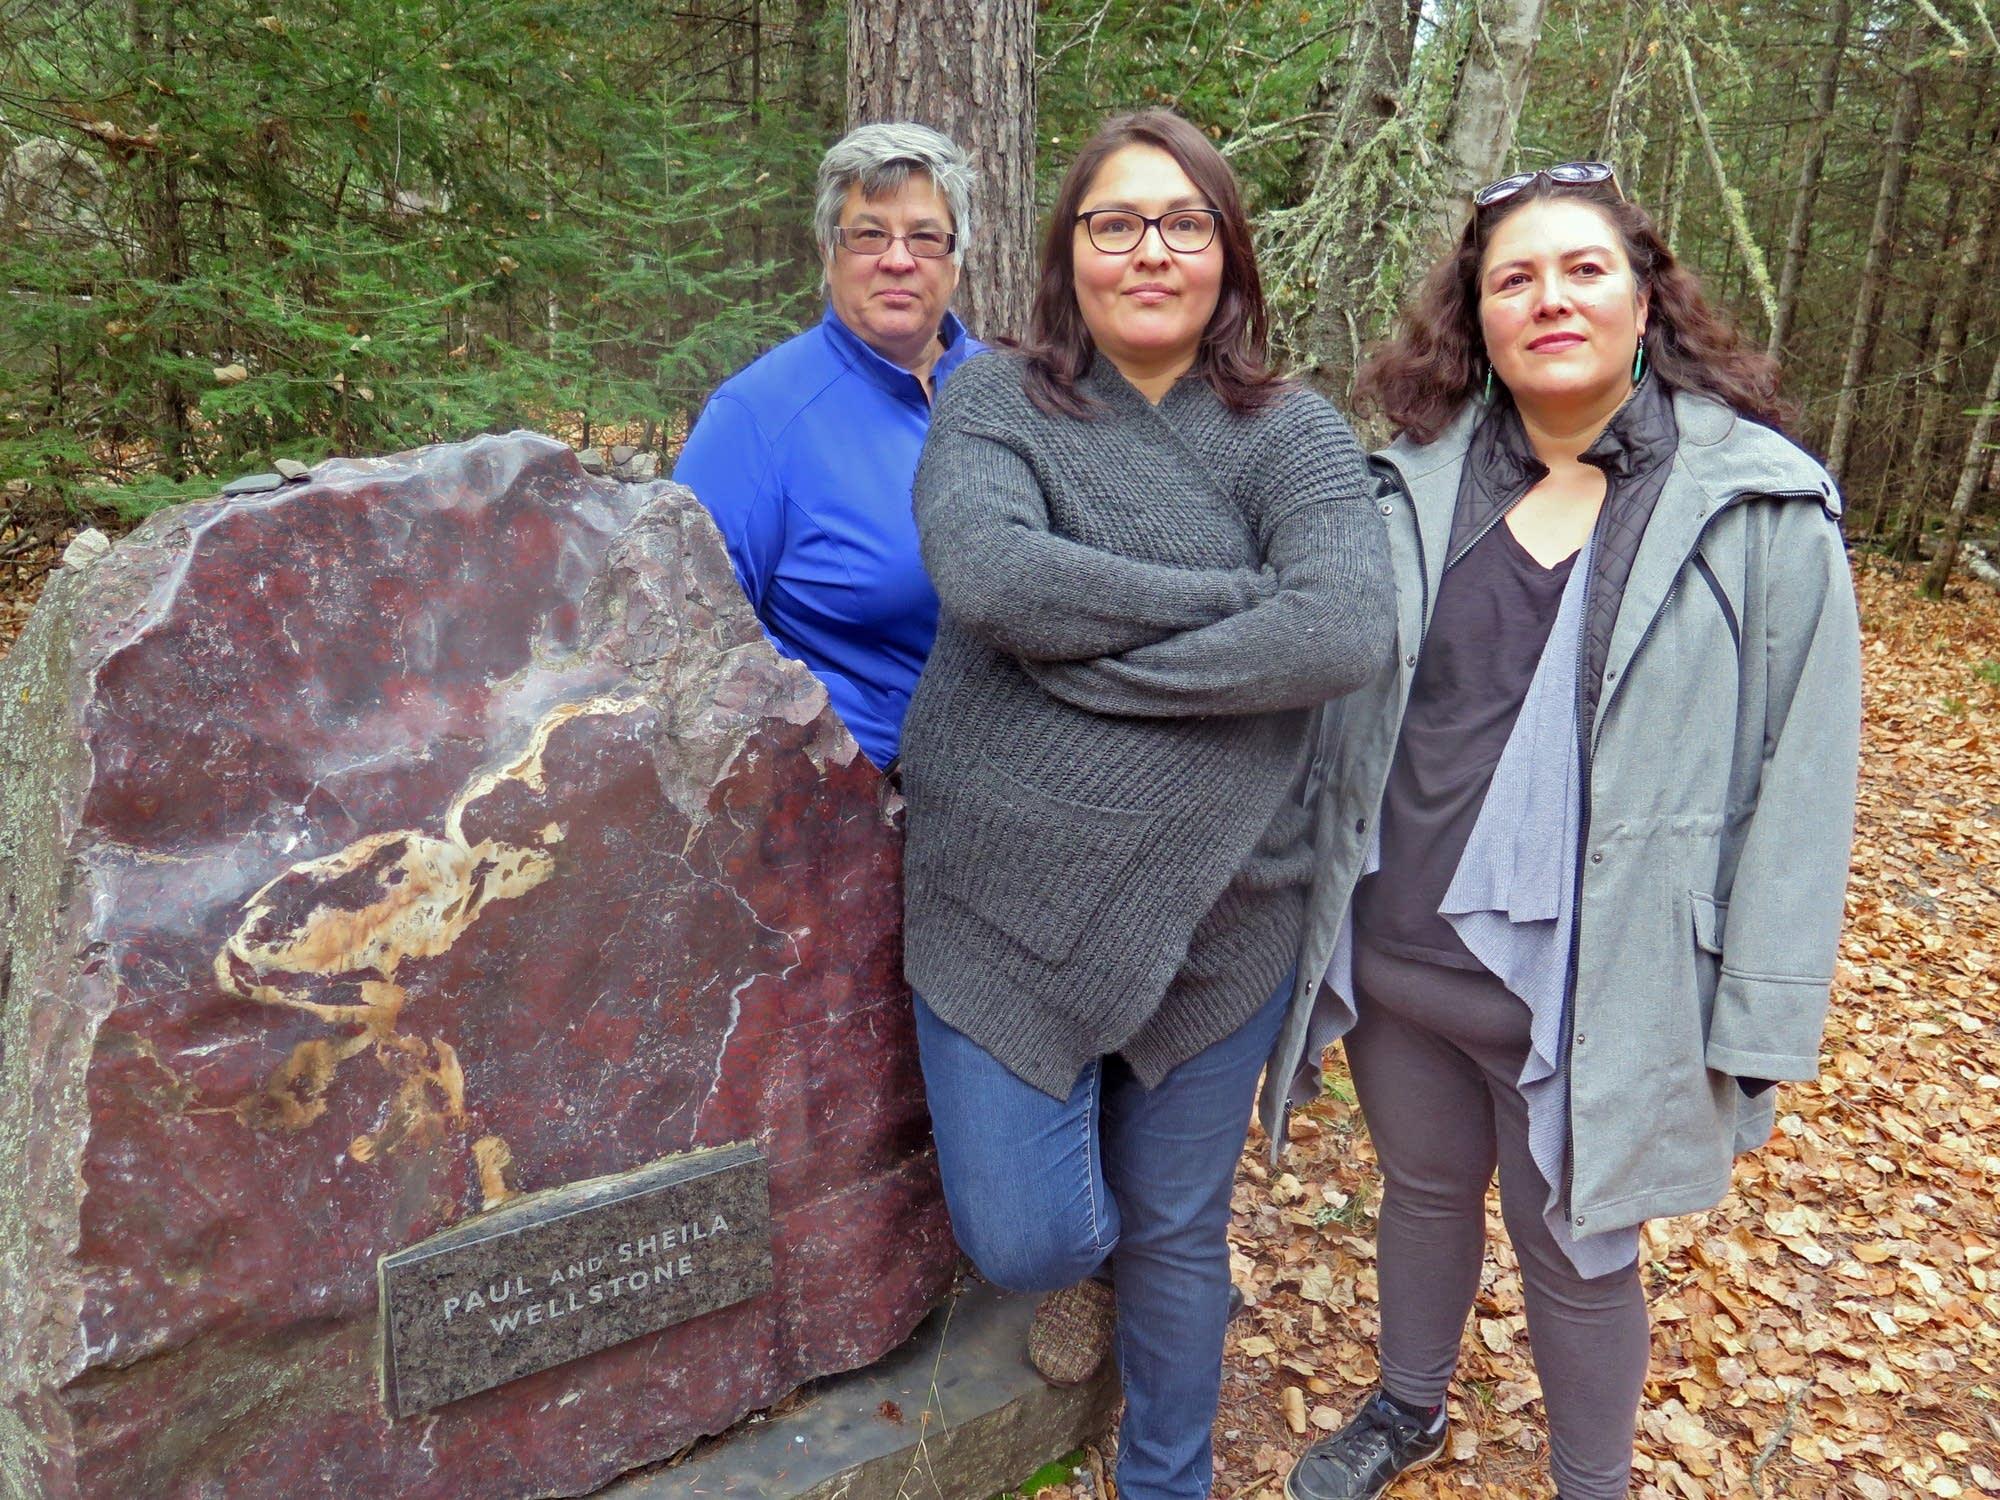 Lori Janatopoulos, Nevada Littlewolf and LeAnn Littlewolf at memorial.